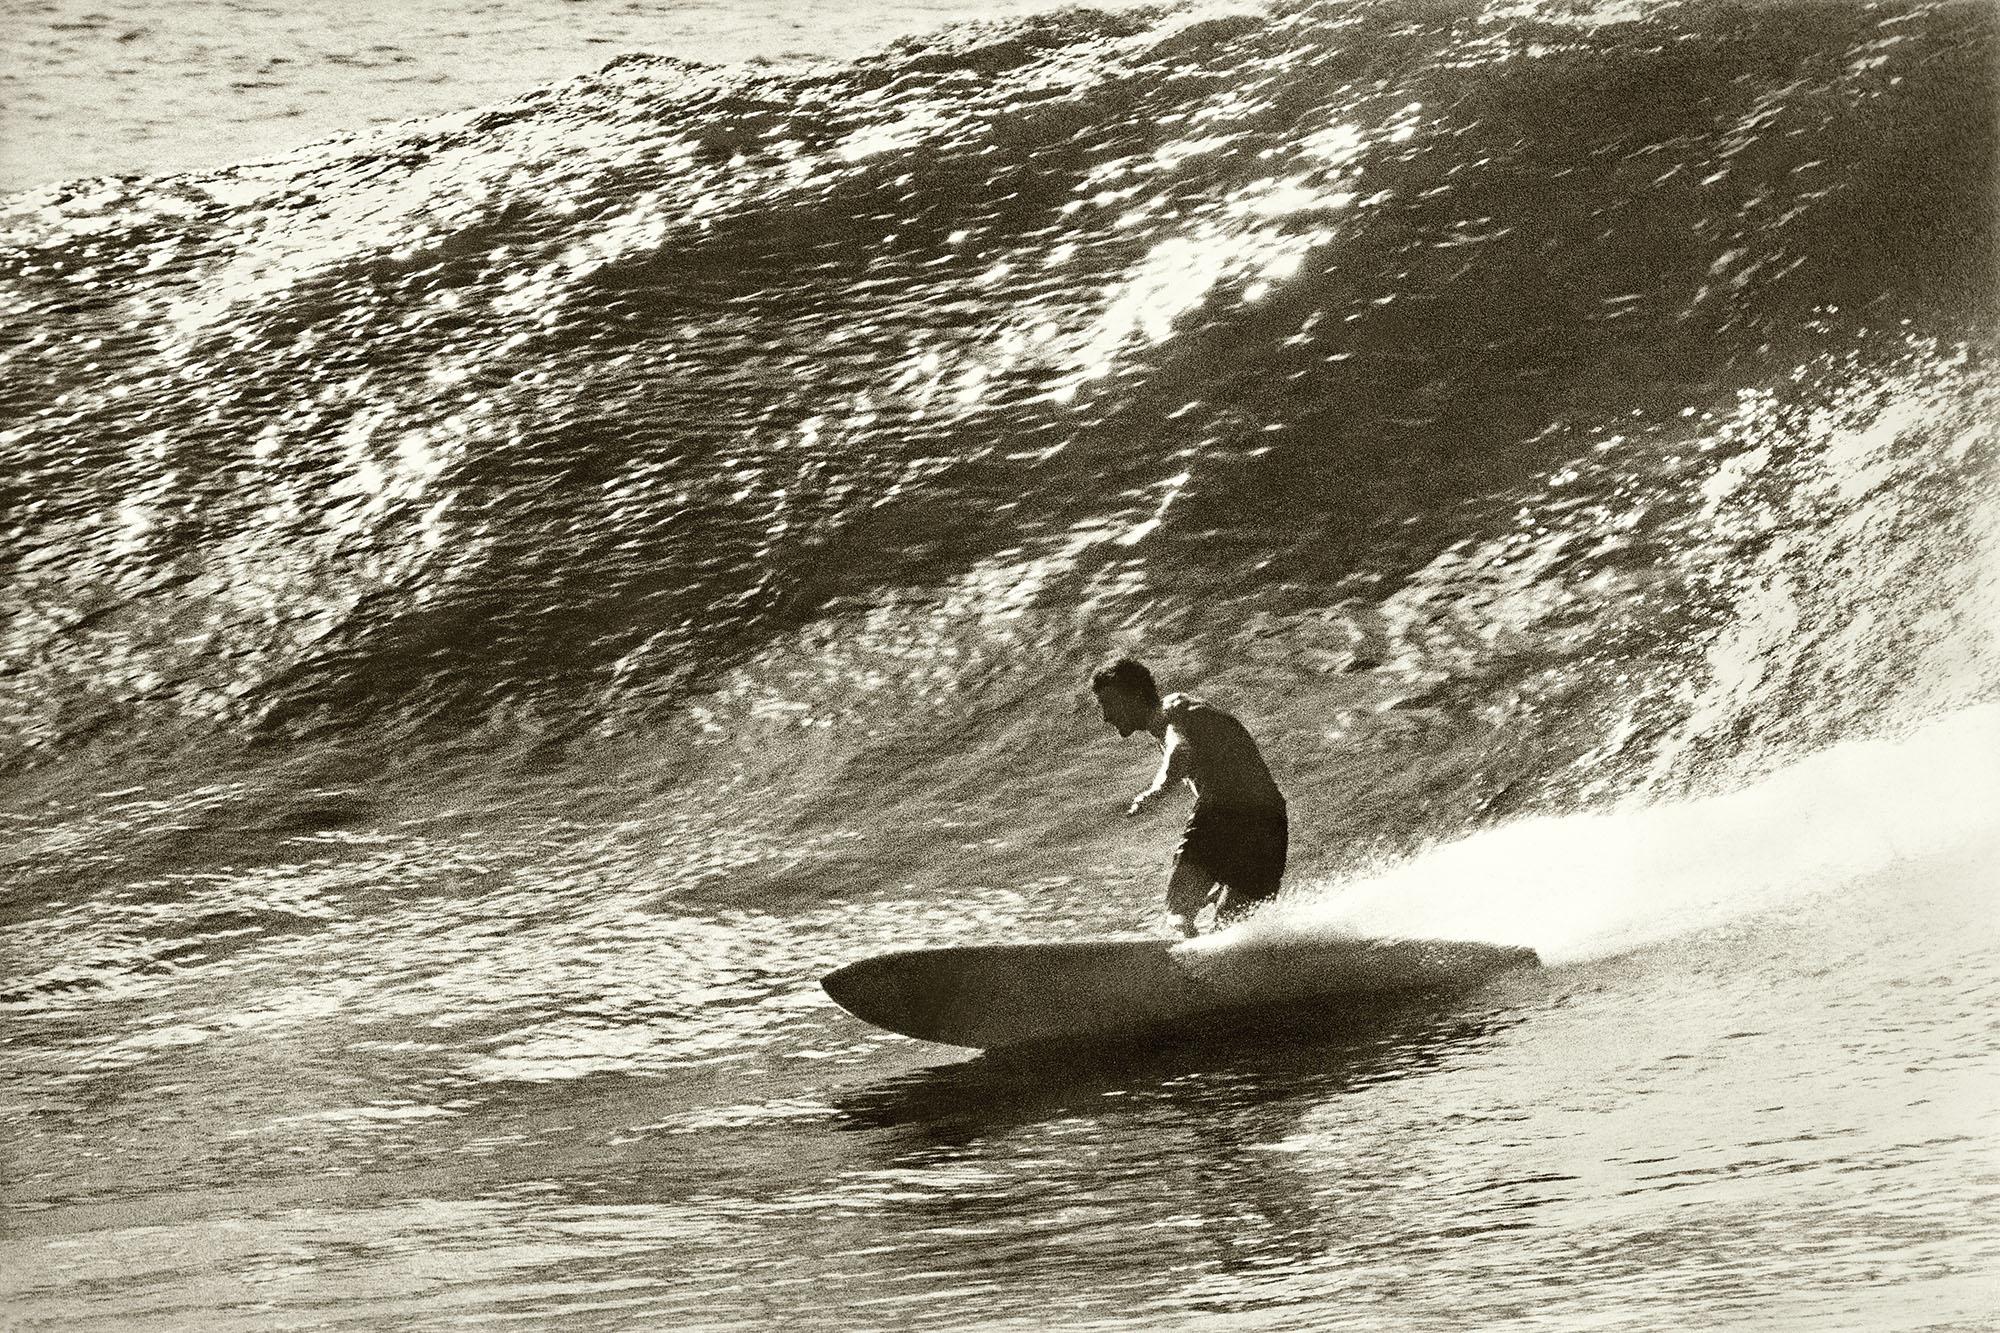 Nat Young - Honolua Bay - 1967